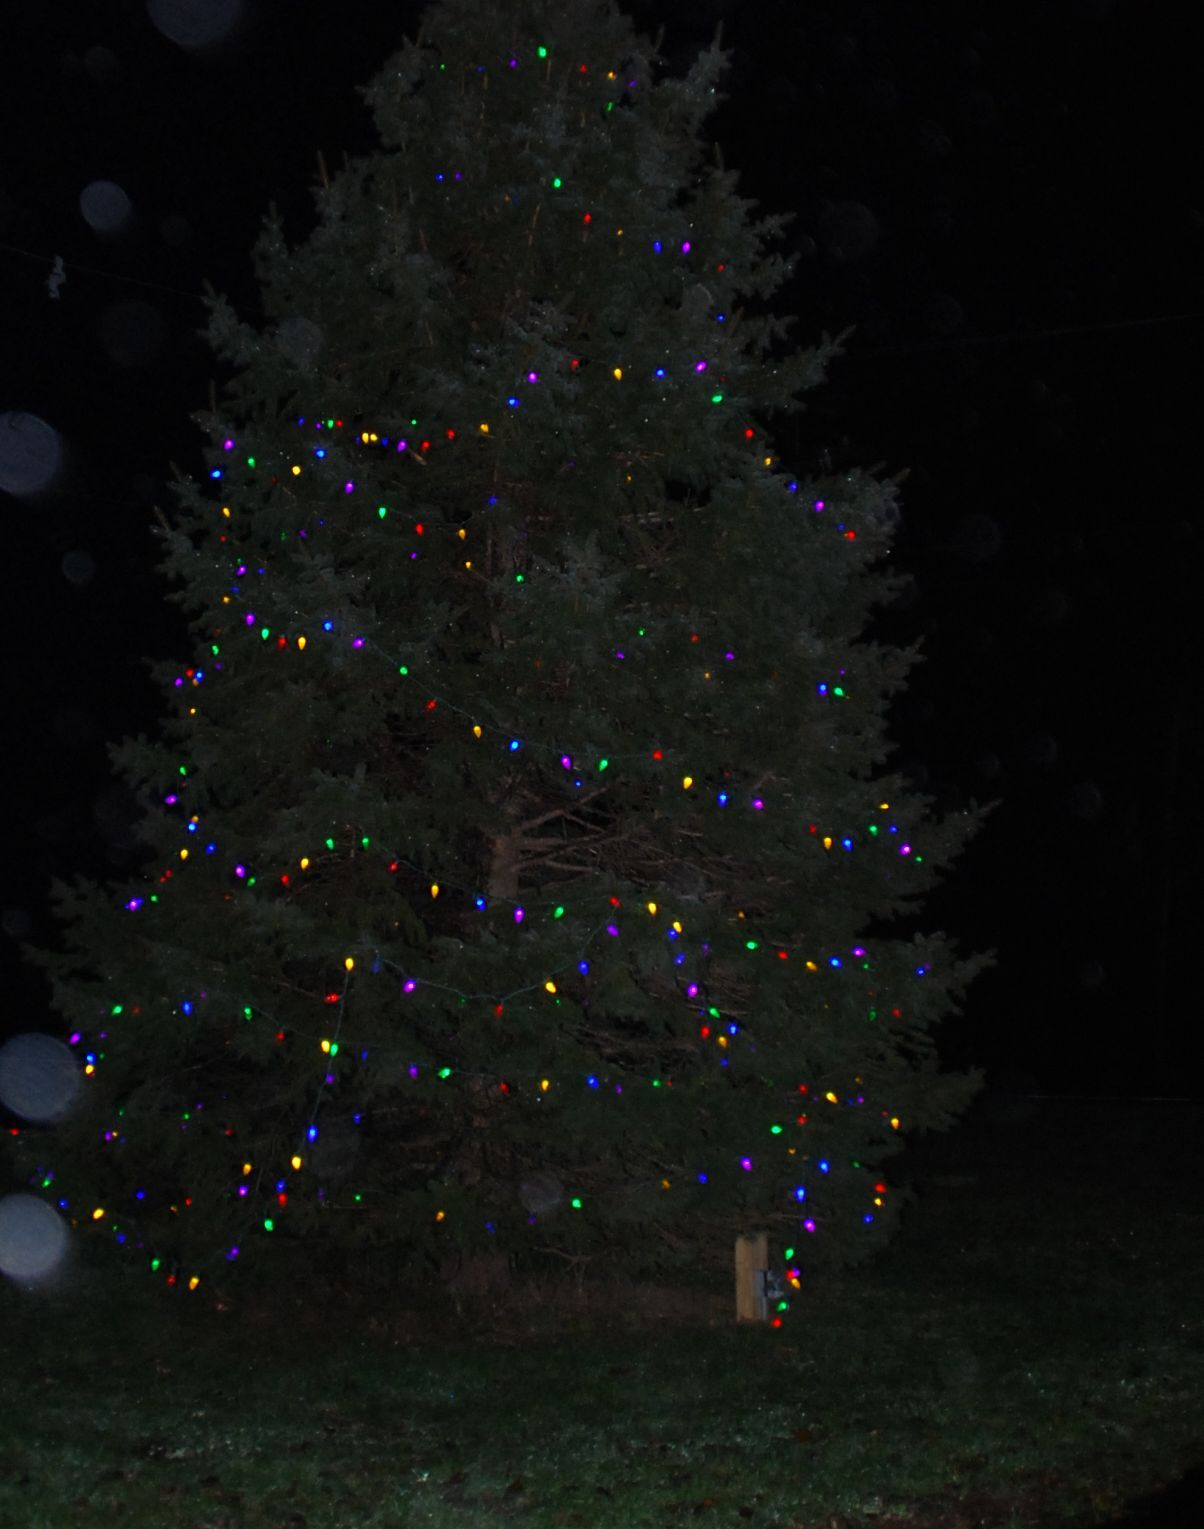 84c4b42916d7914443fa_tree_003.jpg